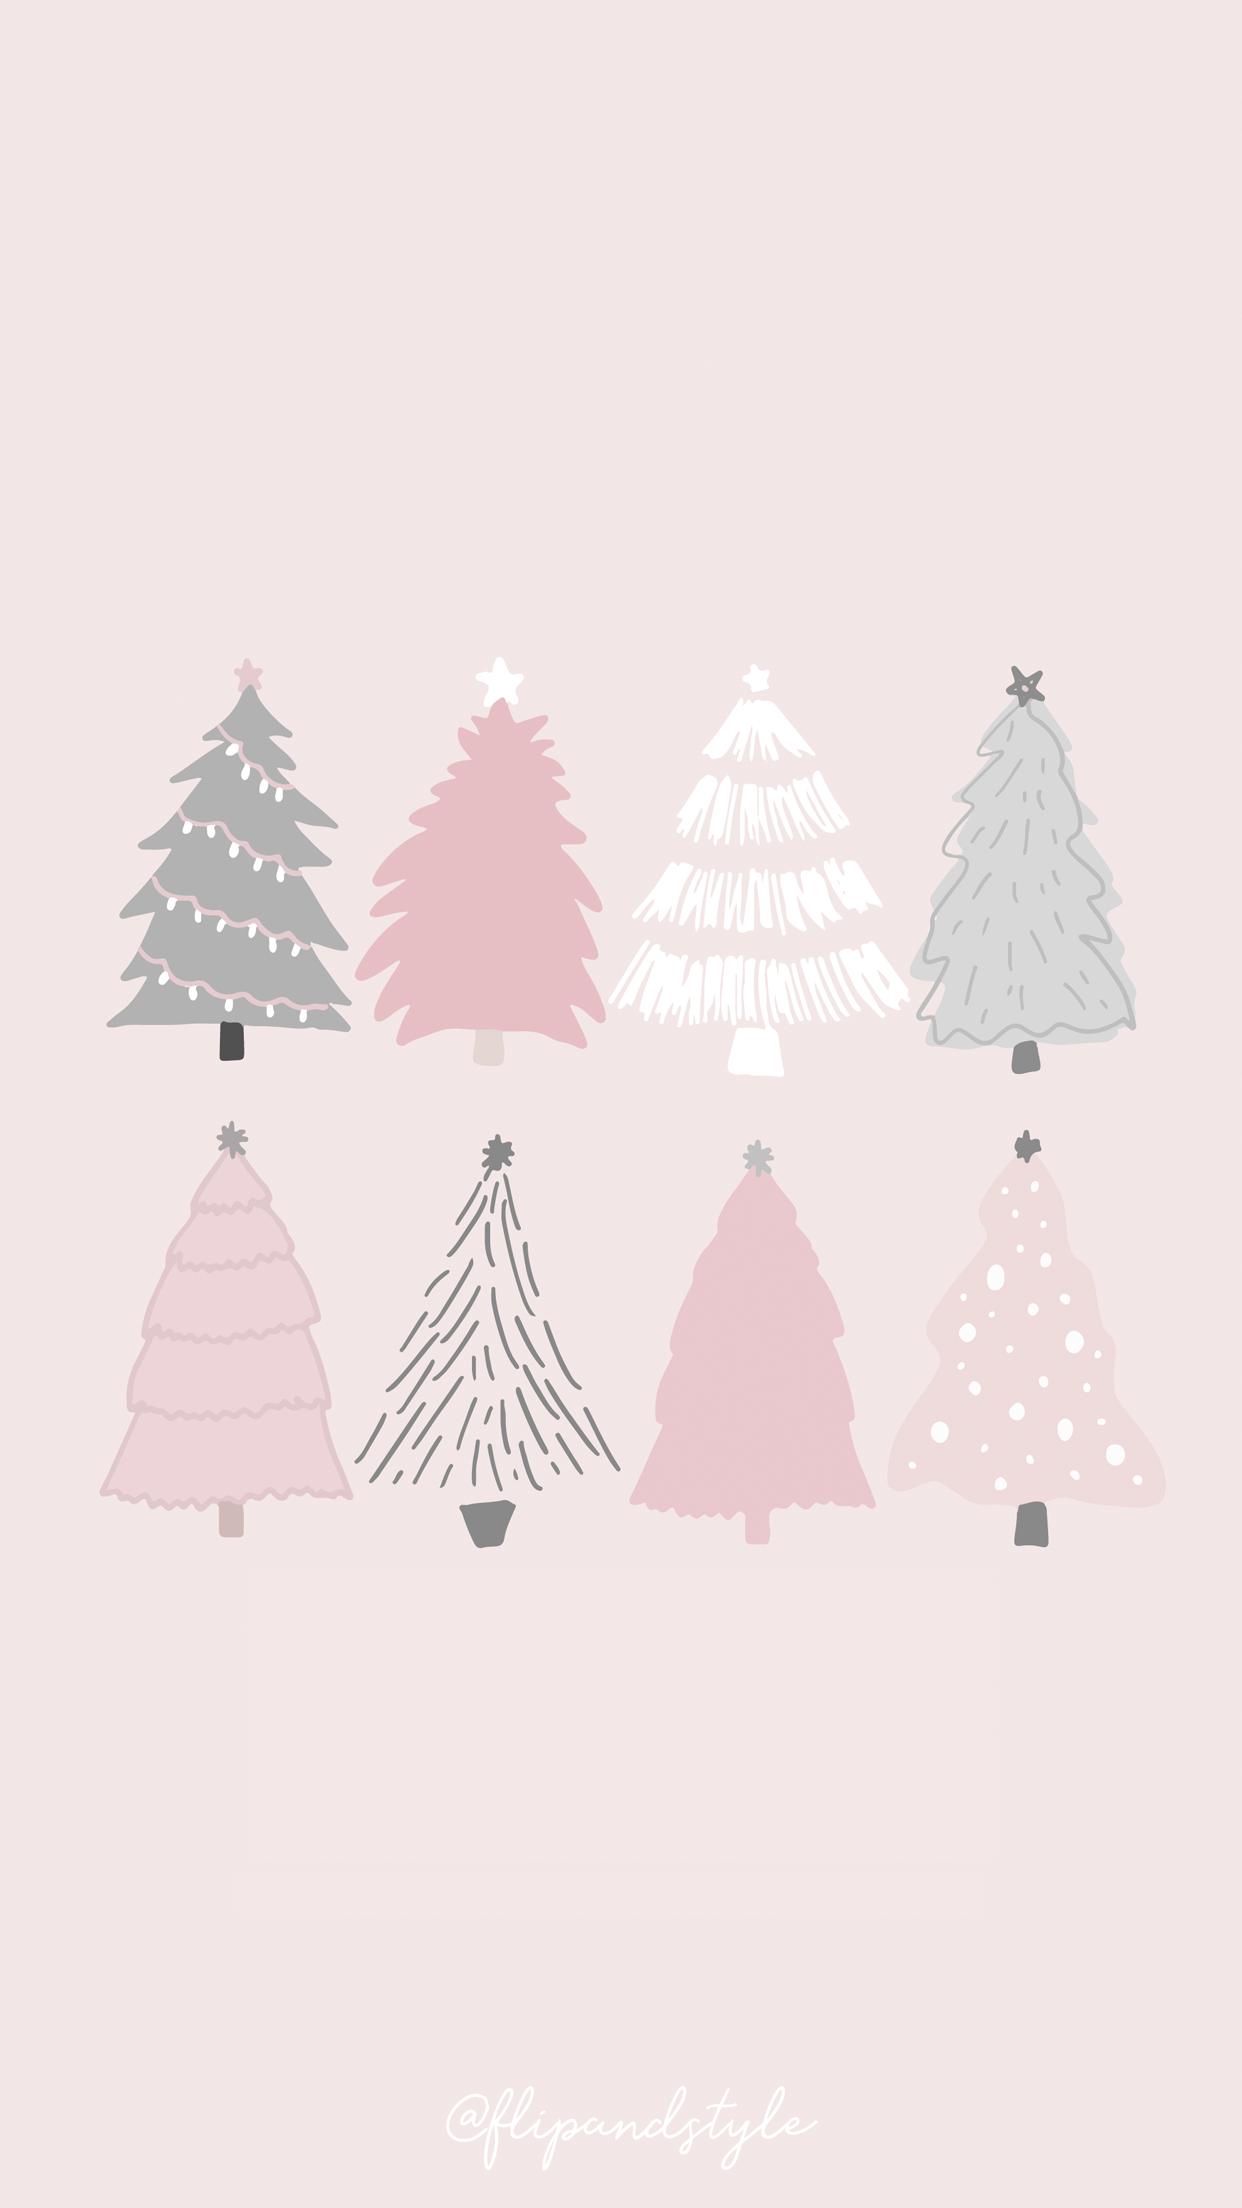 Pin By April On Christmas Pinterest Navidad